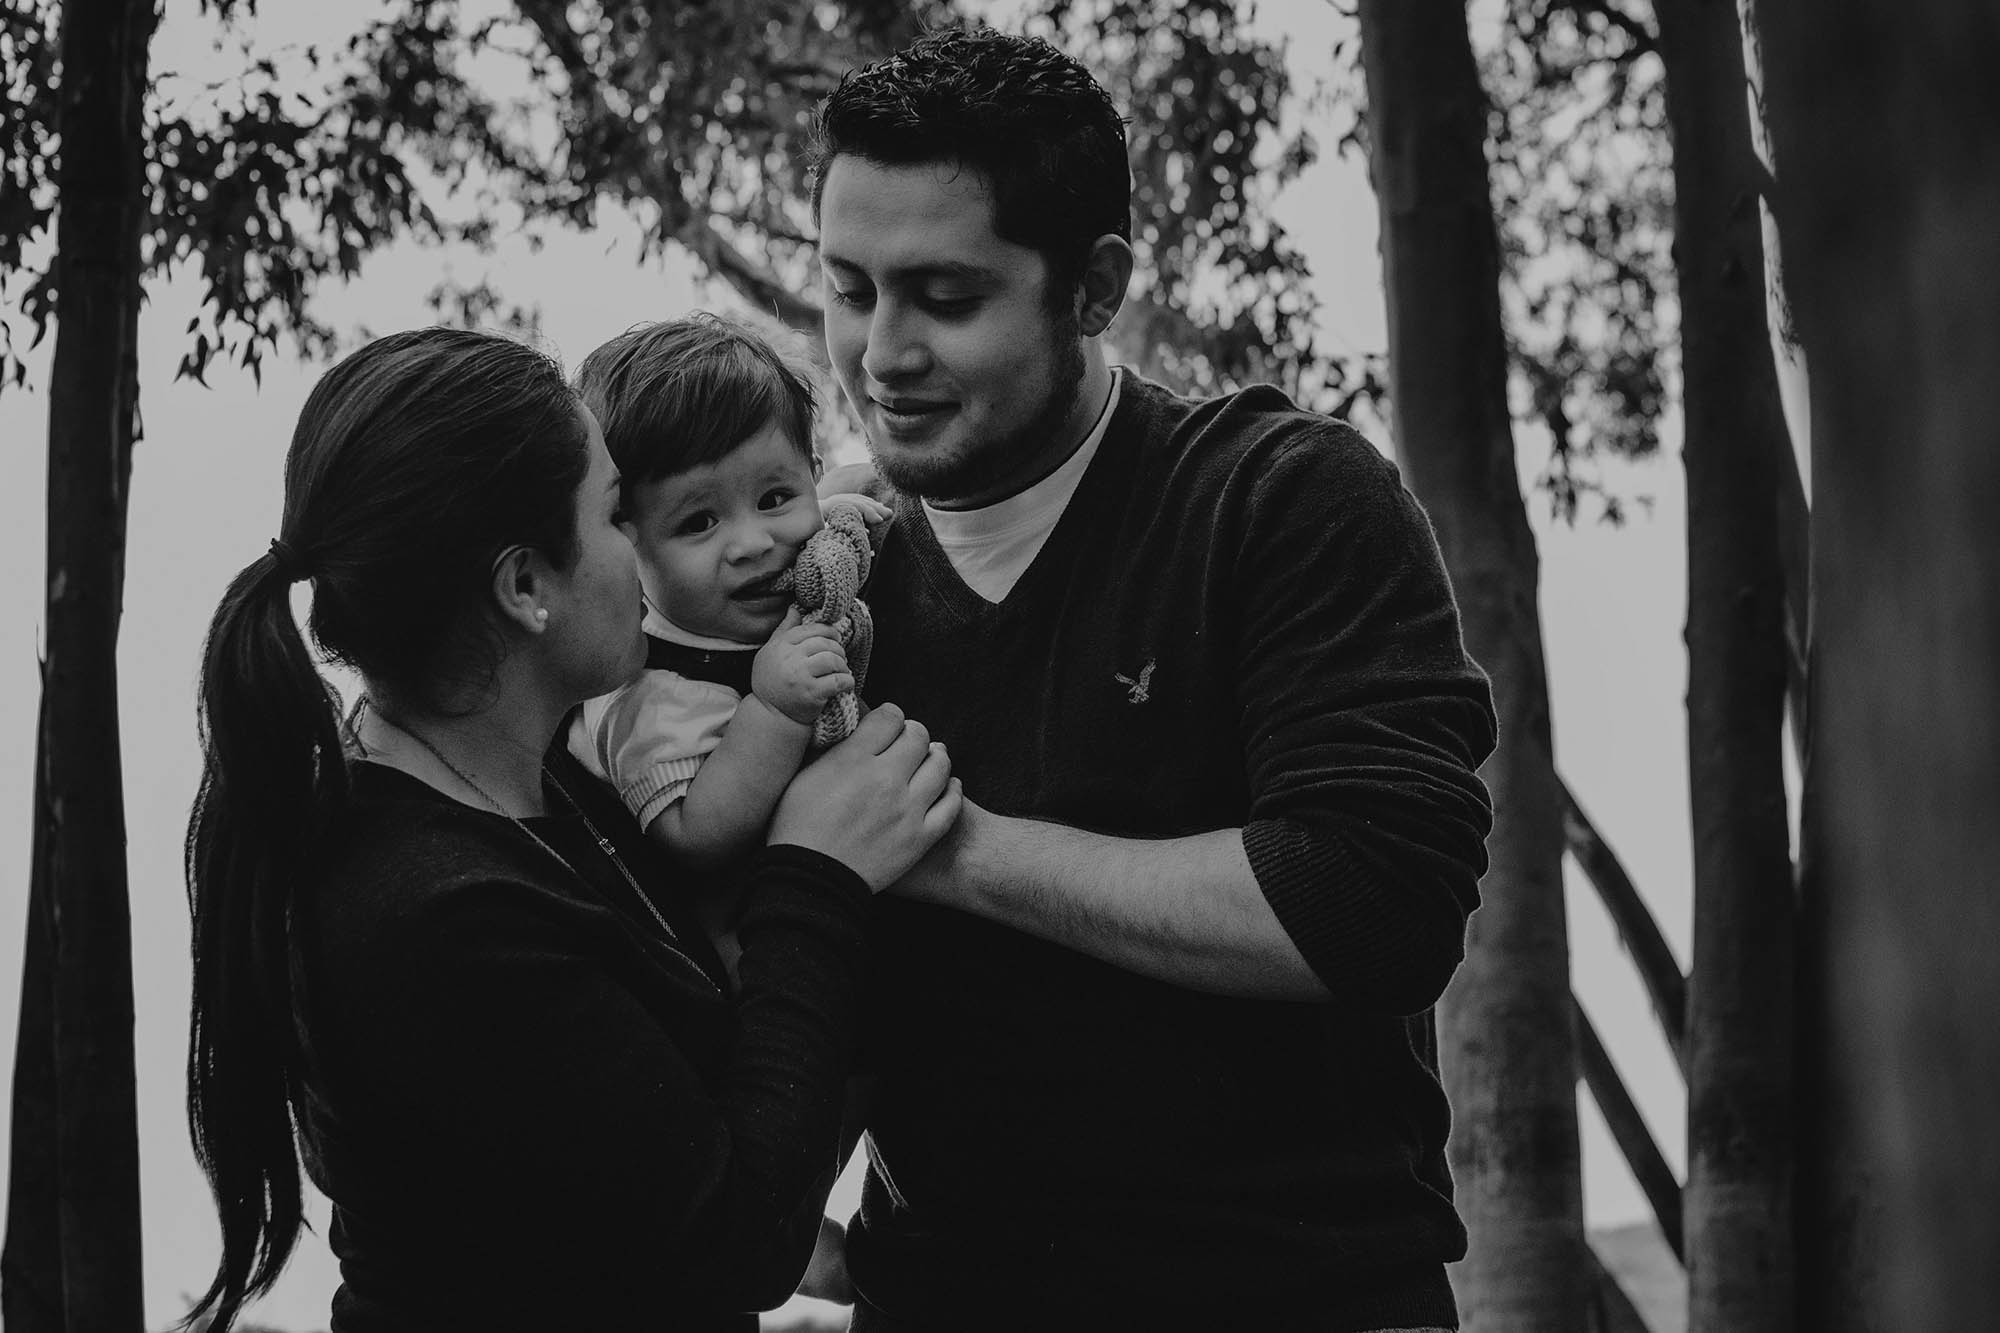 fotografo-de-familia-Queretaro-Emiliano-2.jpg